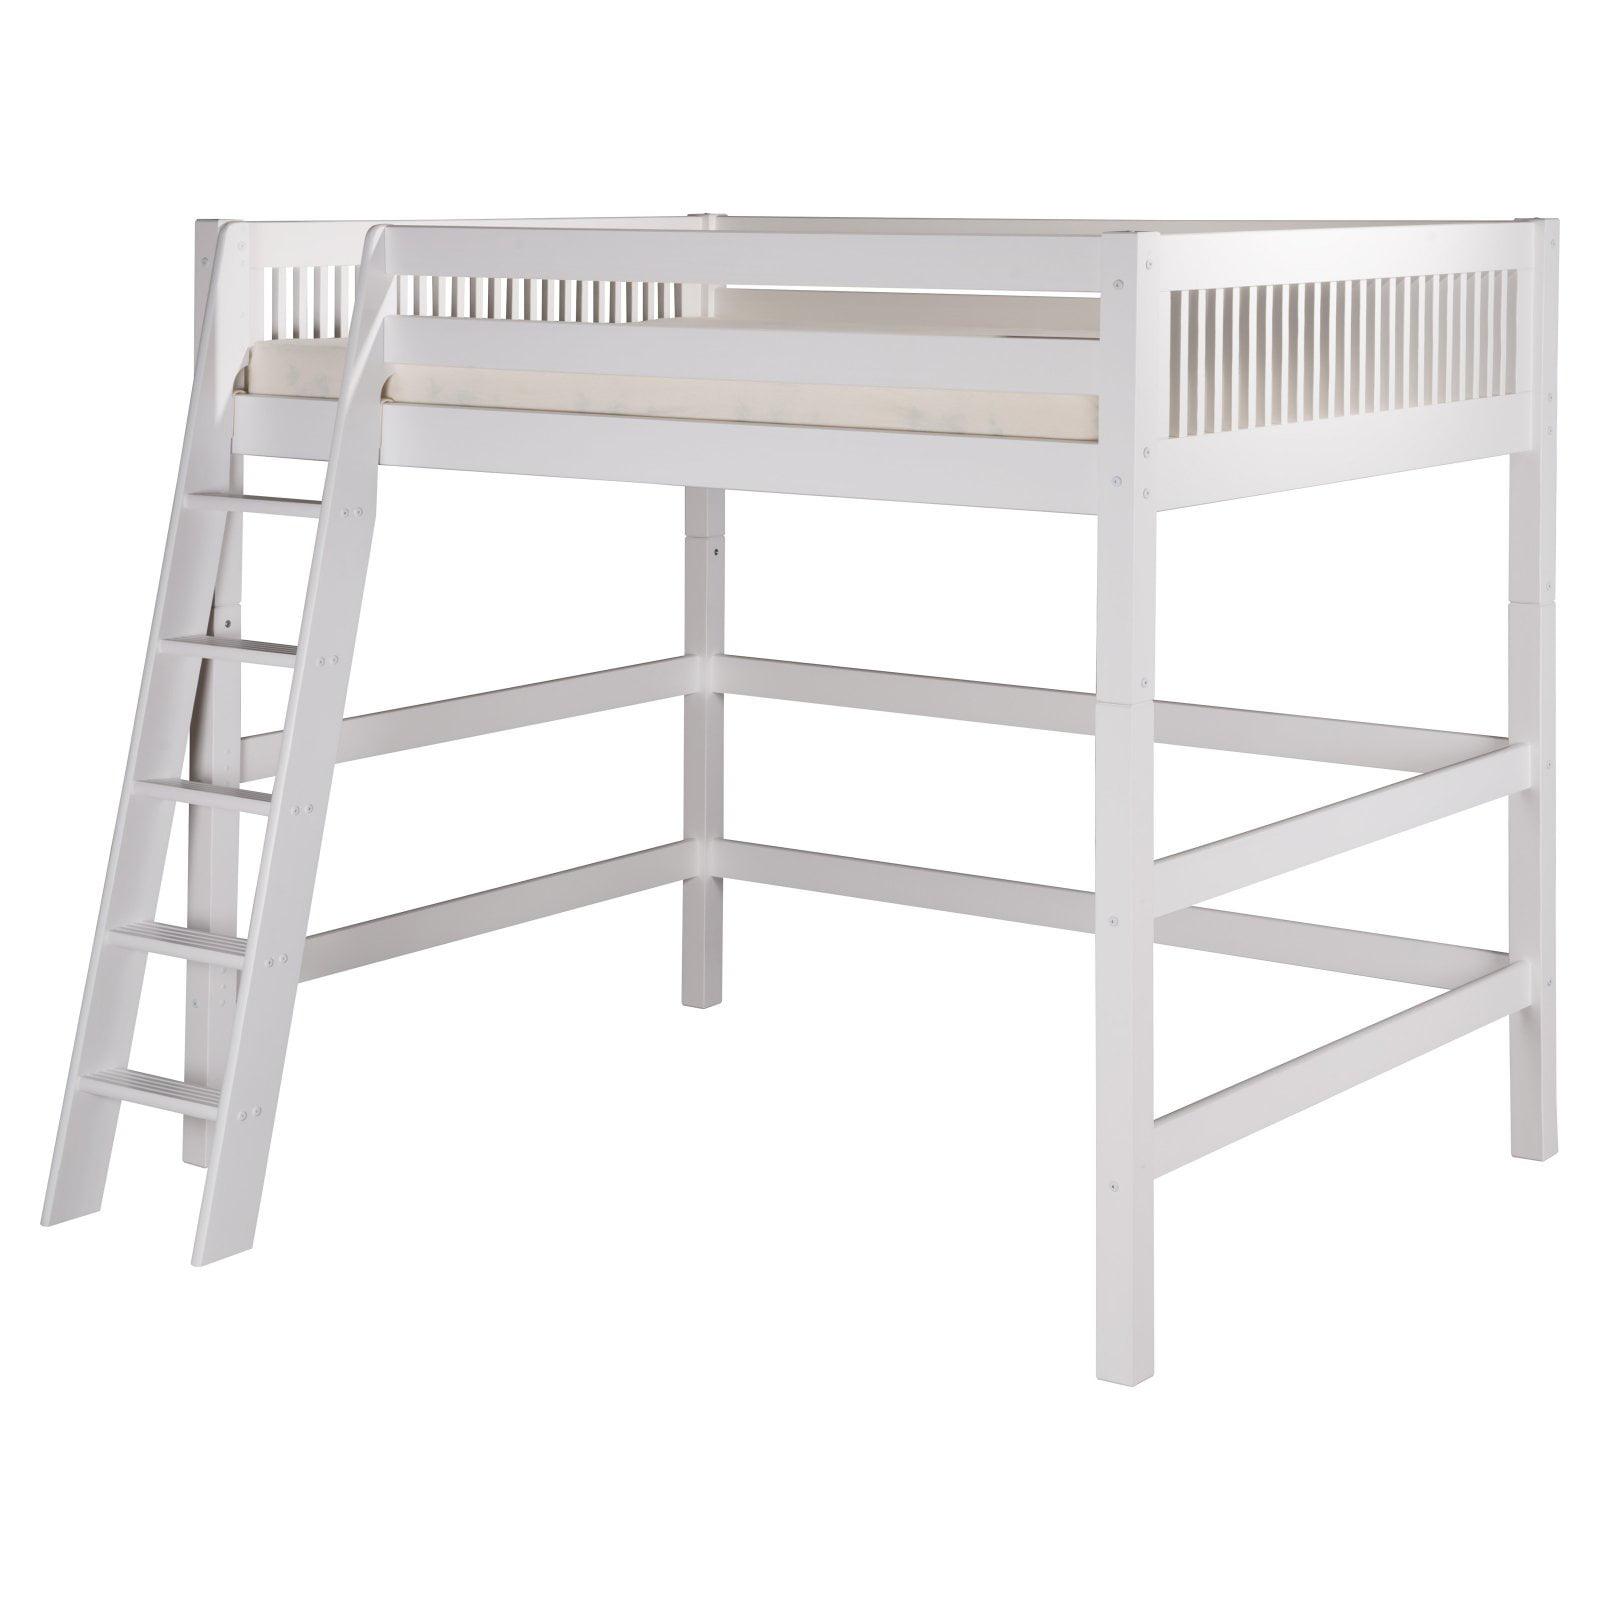 Camaflexi Full Size High Loft Bed - Mission Headboard - White Finish